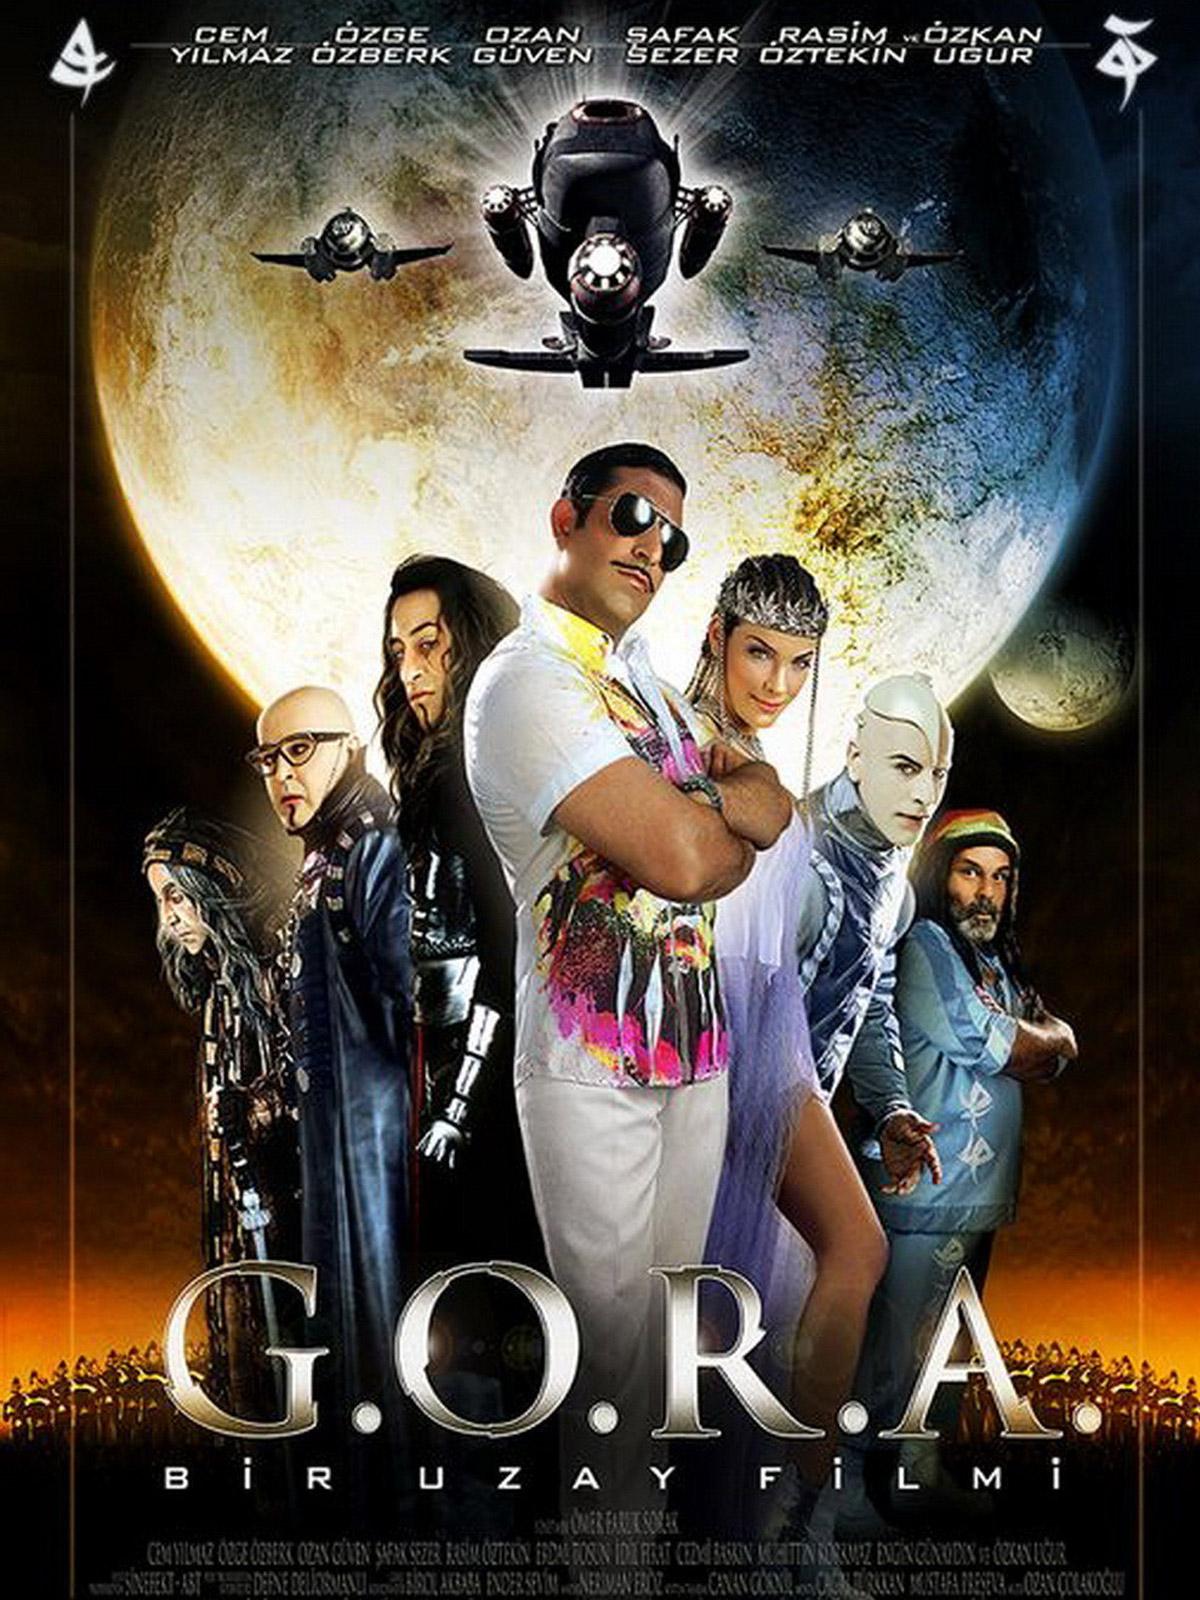 G.O.R.A. afiş - Afiş 1 - Beyazperde.com C.o.g. Movie